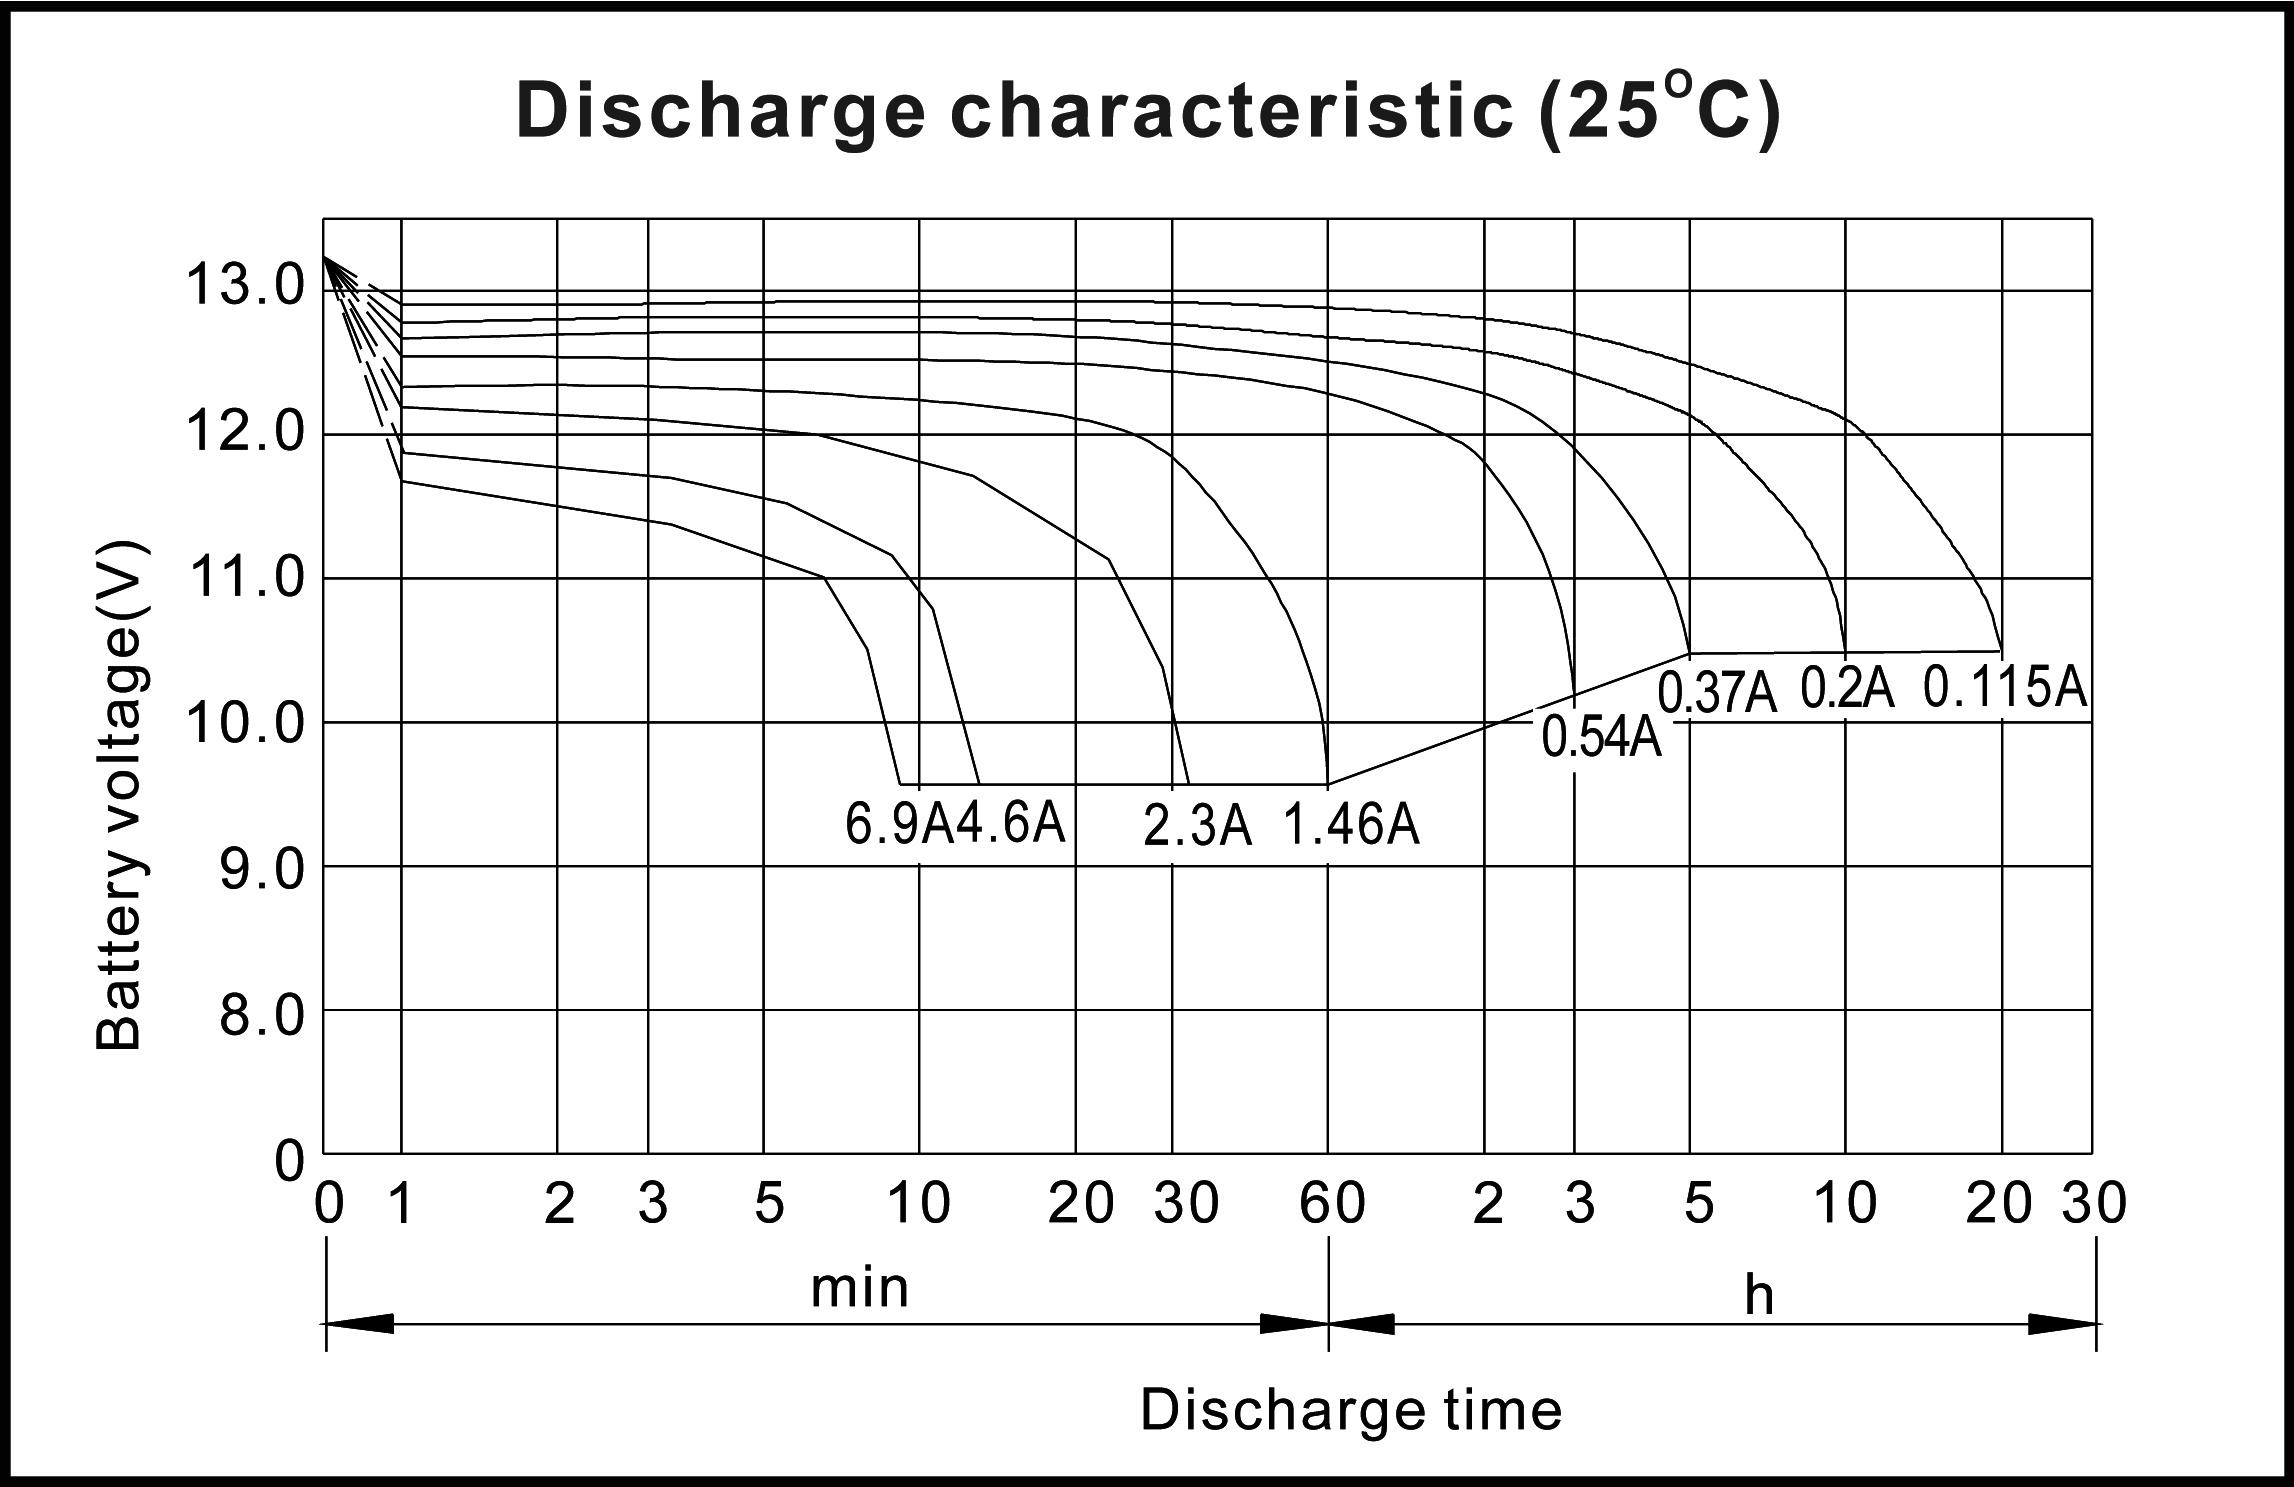 TLV1223 12V 2.3Ah Sealed Lead Acid Battery - Discharge Characteristics